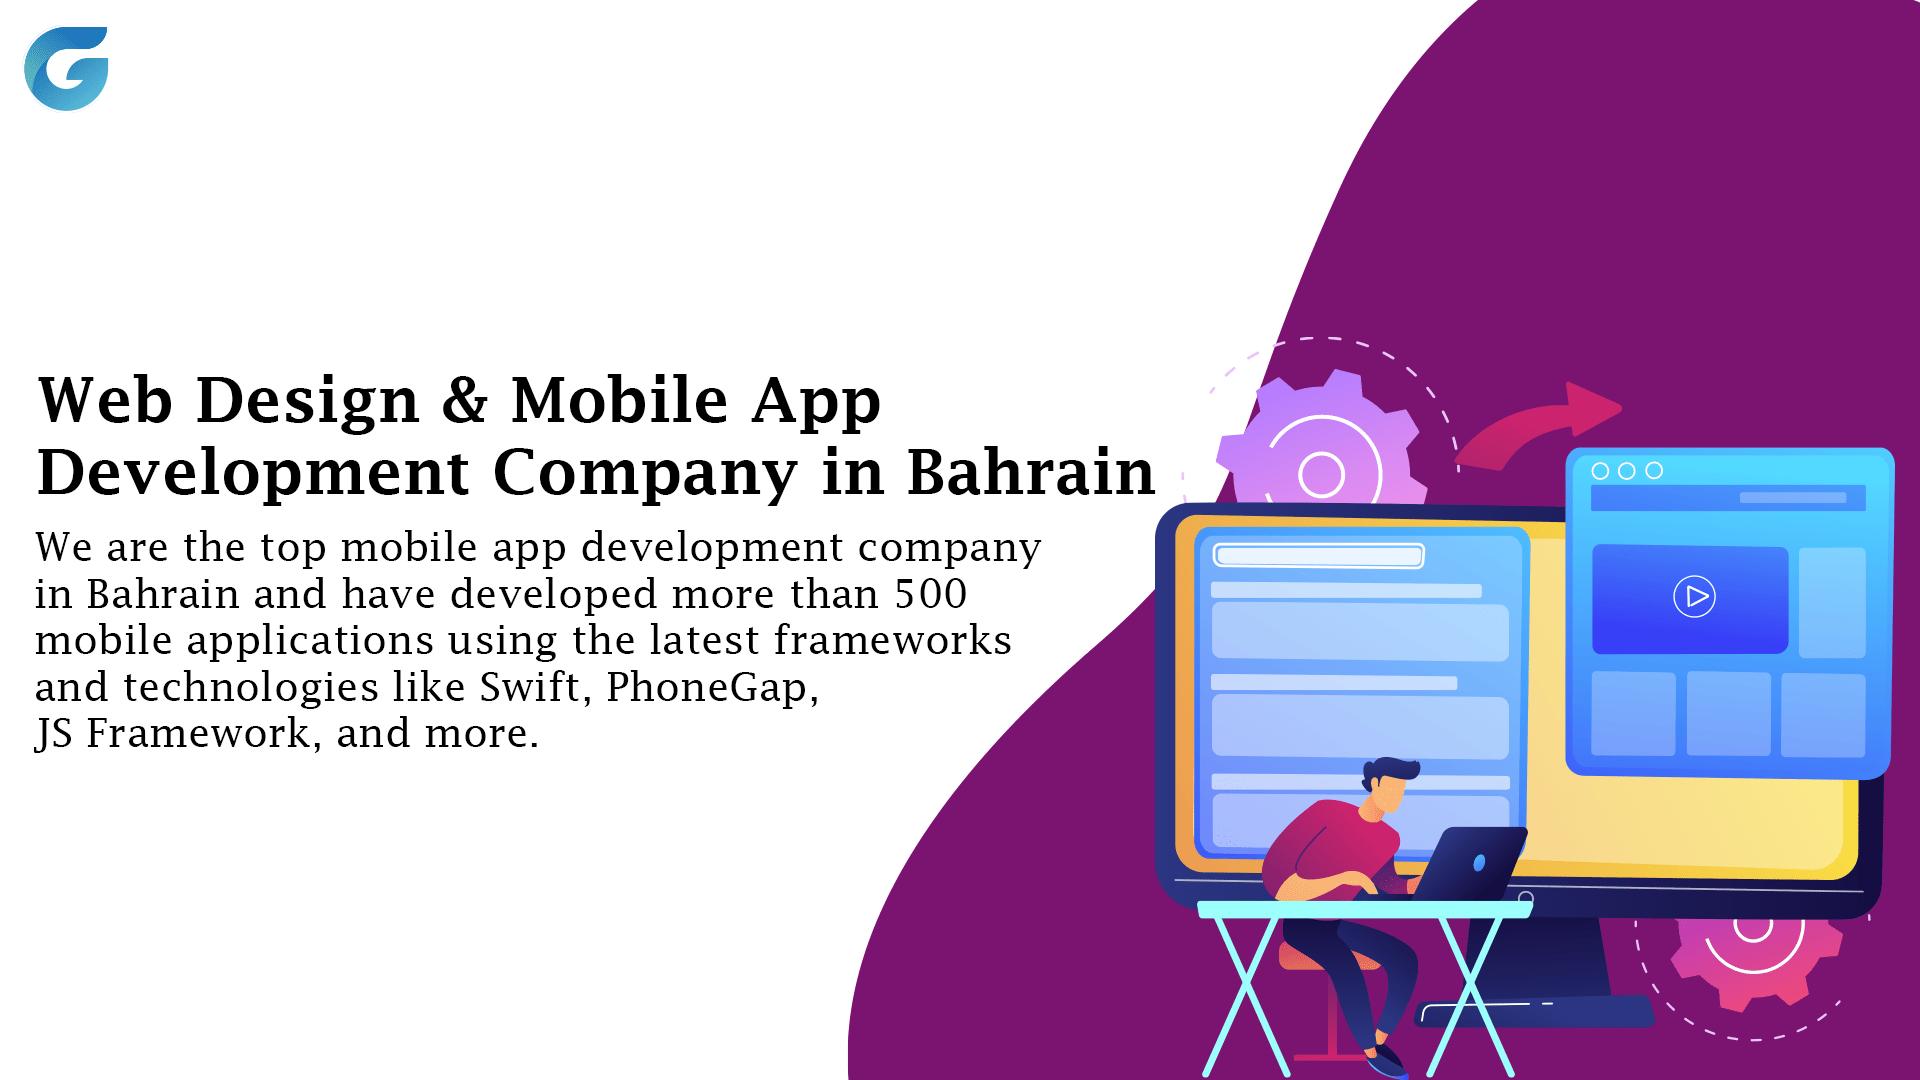 Web Design & Mobile App Development Company in Bahrain